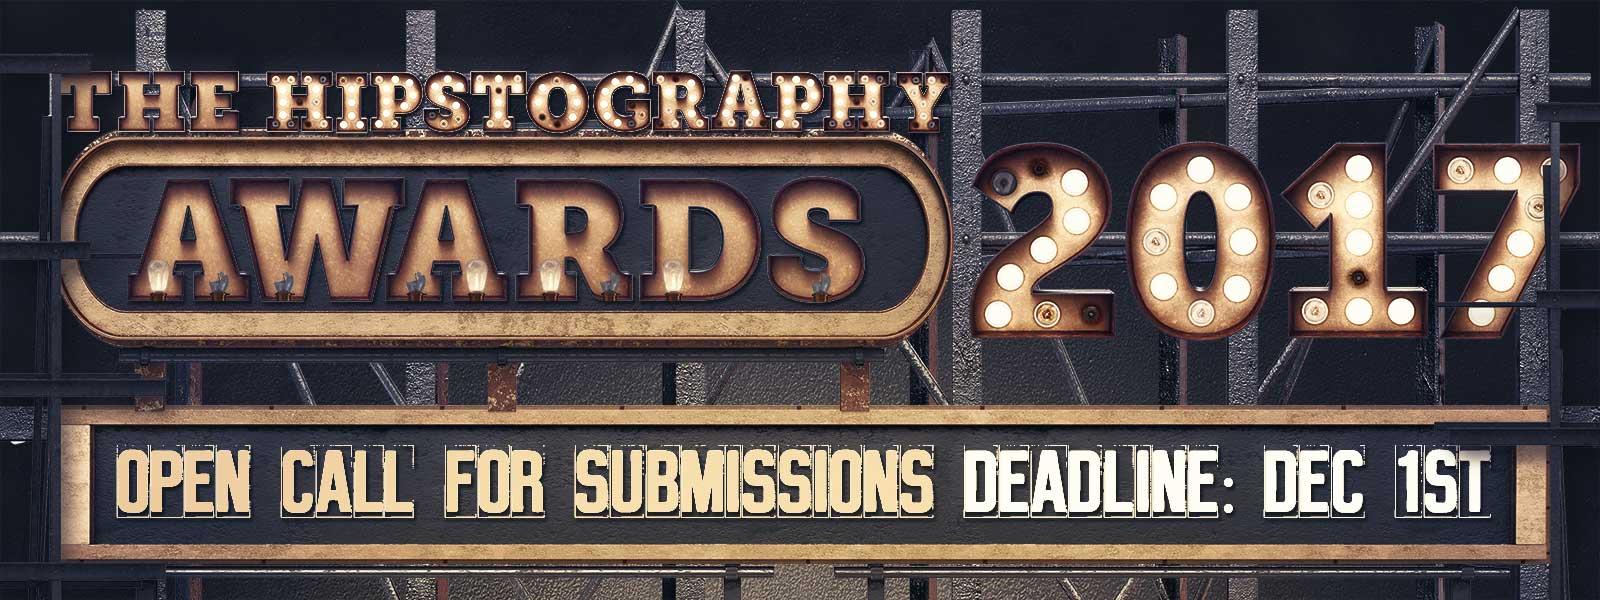 Awards-2017-Open-Call-banner